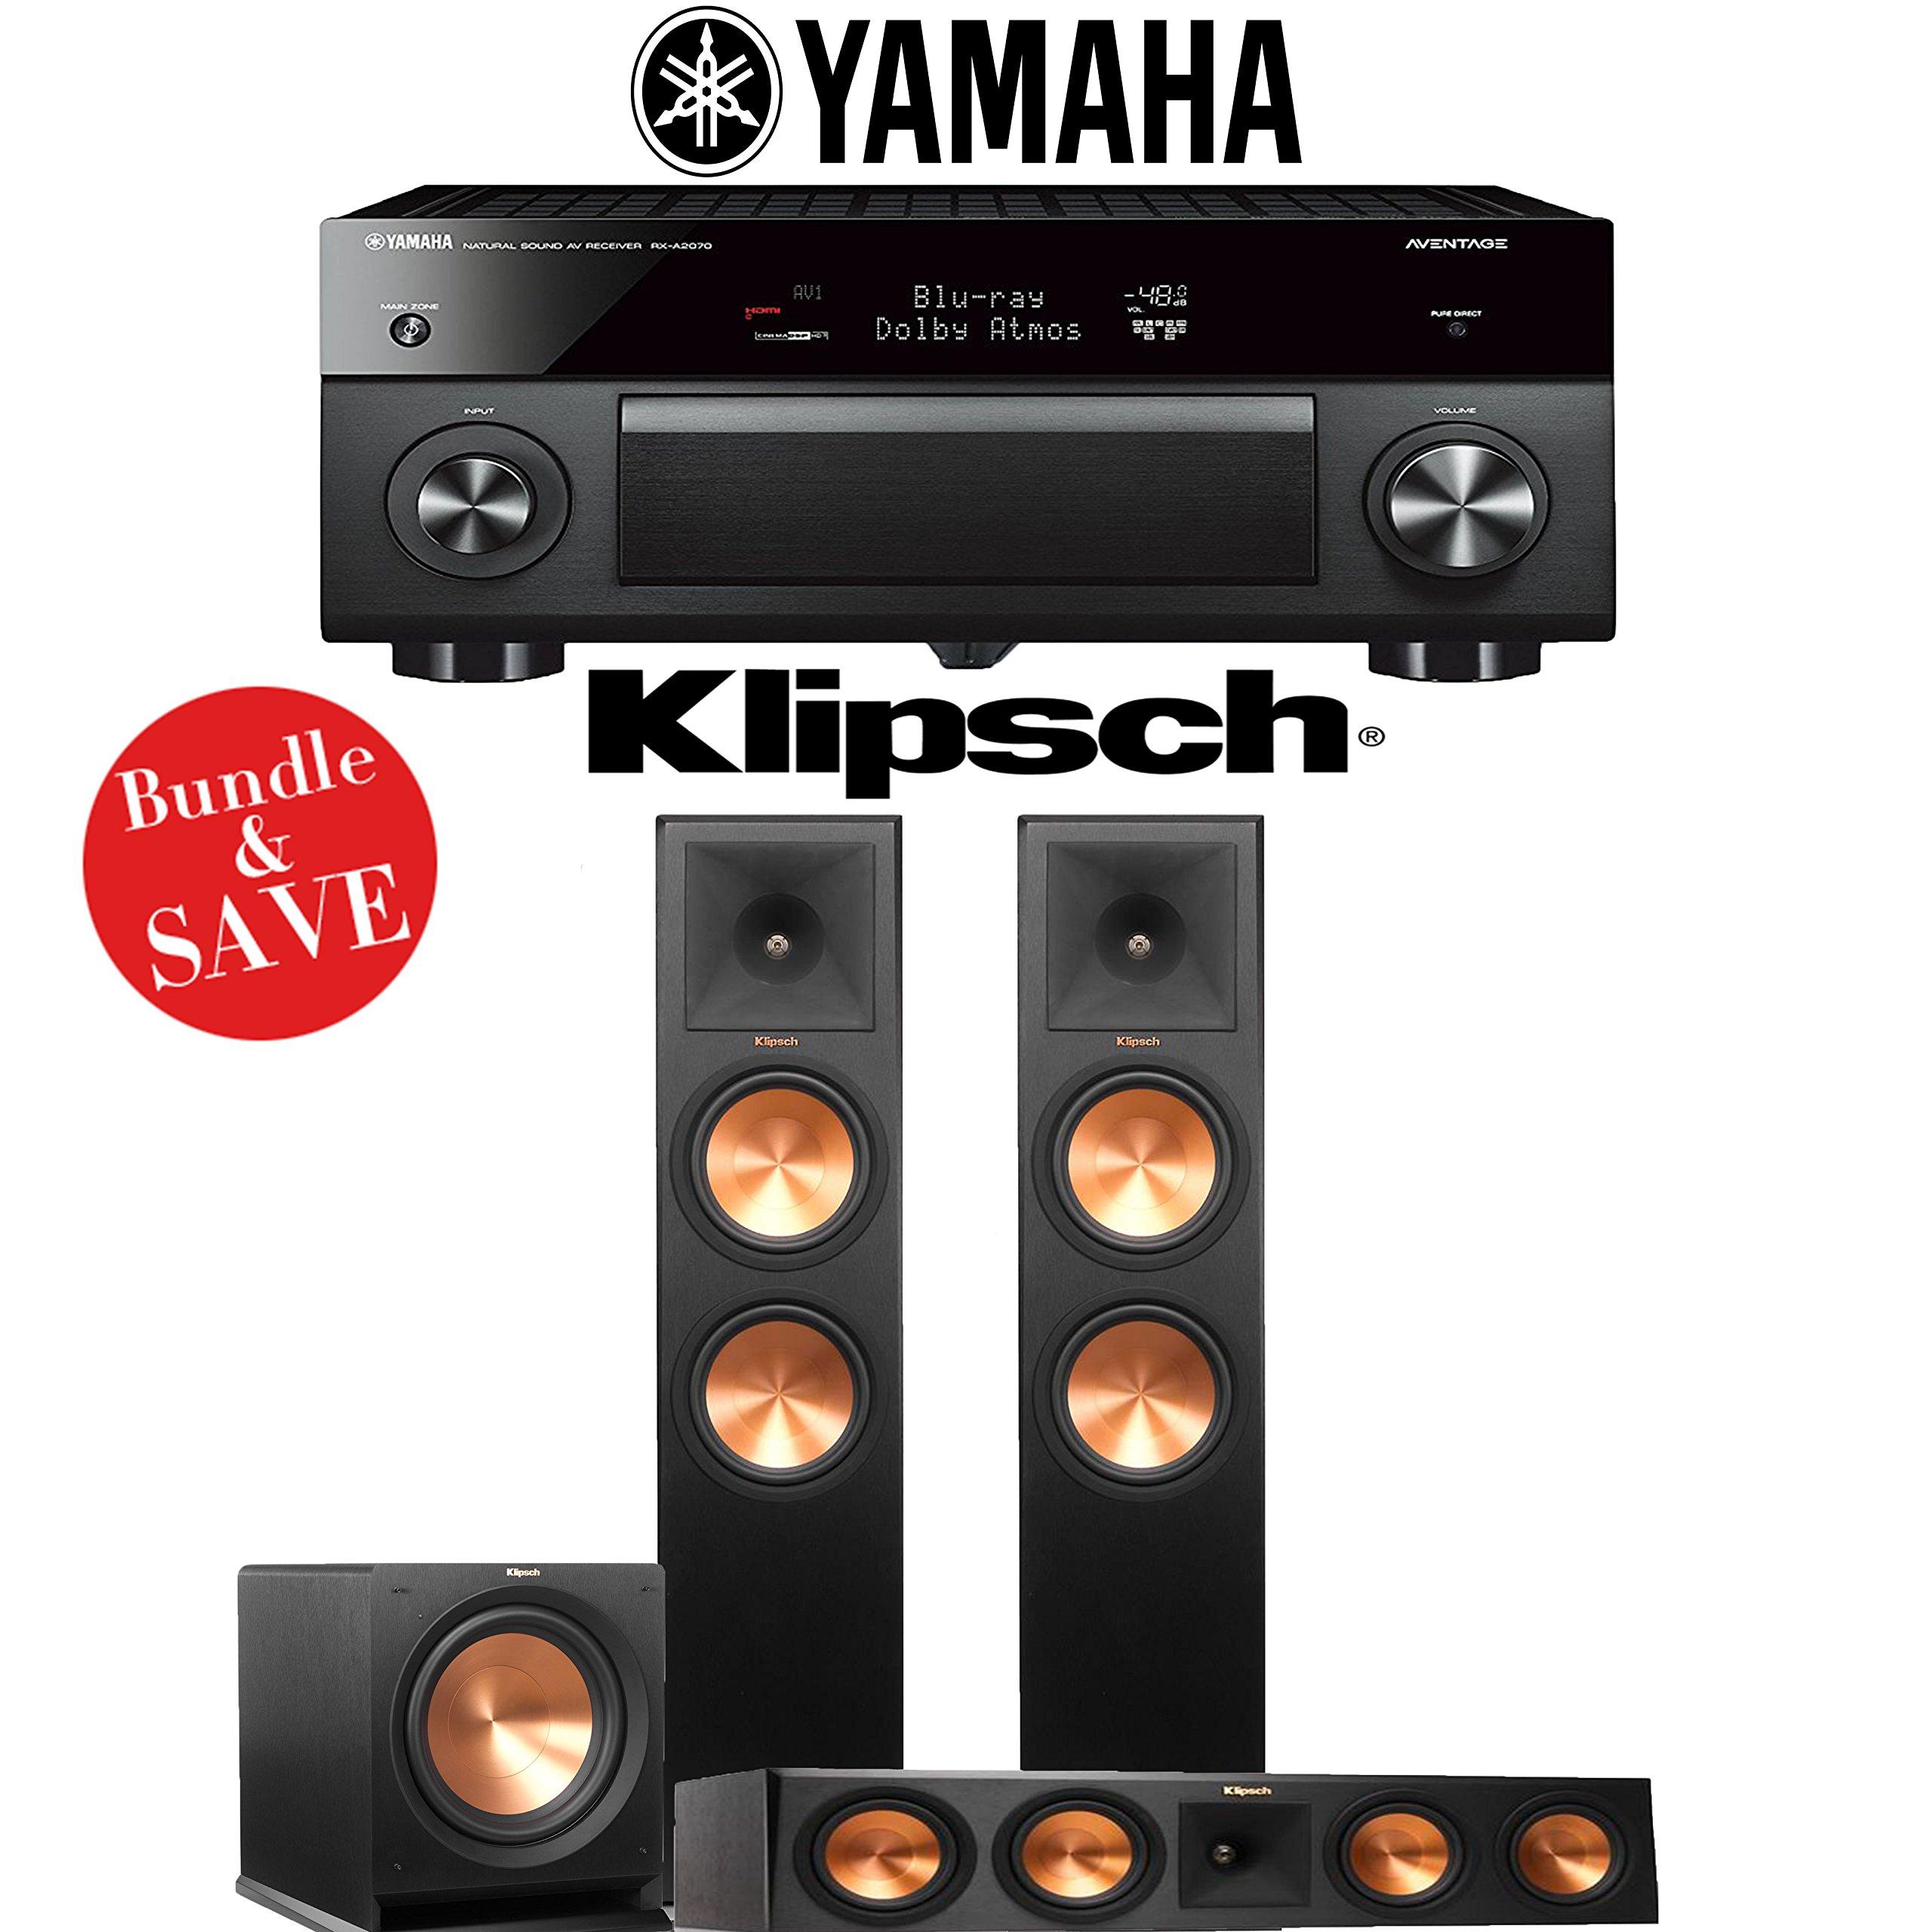 Yamaha AVENTAGE RX-A2070BL 9.2-Ch 4K Network AV Receiver + Klipsch RP-280F + Klipsch RP-450C + Klipsch R-112SW - 3.1-Ch Home Theater Package by Yamaha